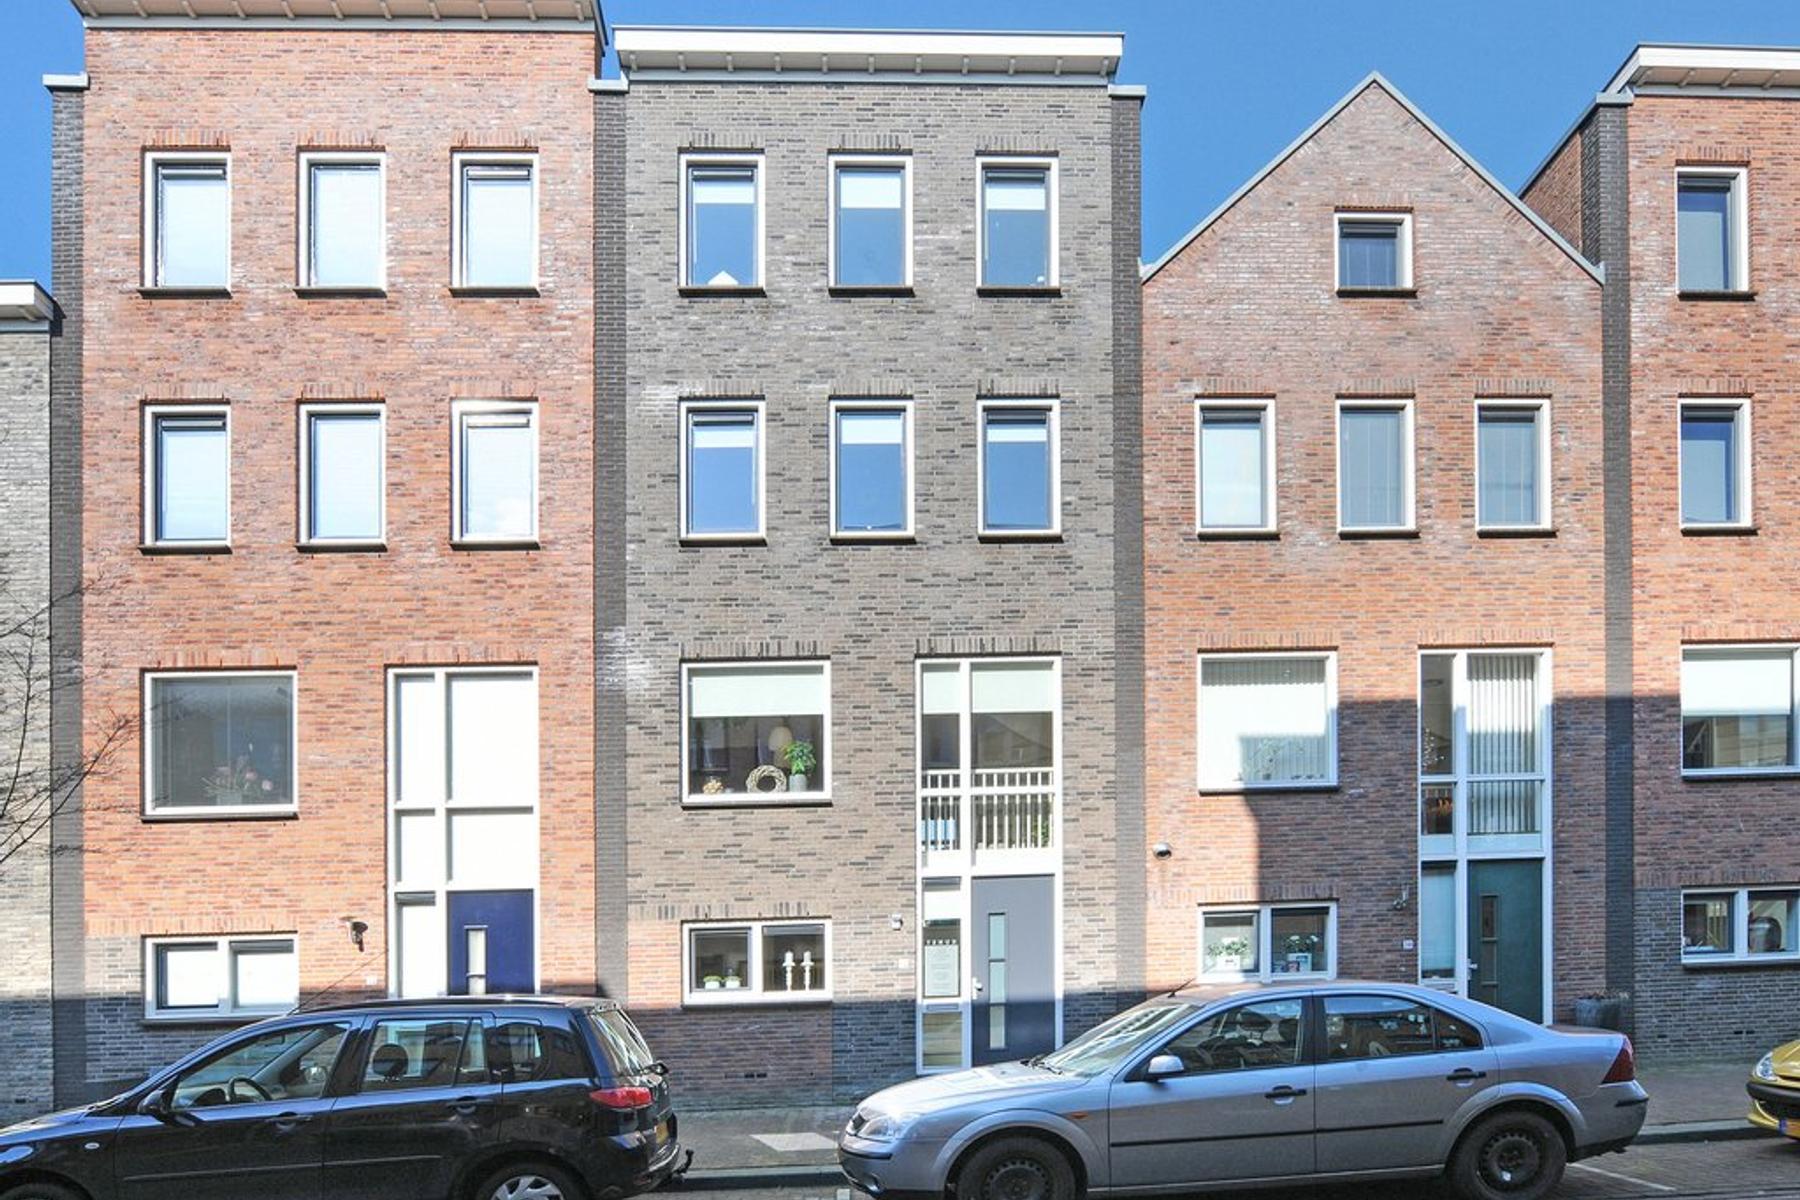 Kuinrestraat 32 in Amersfoort 3826 AG: Woonhuis. - Makelaardij De Parel